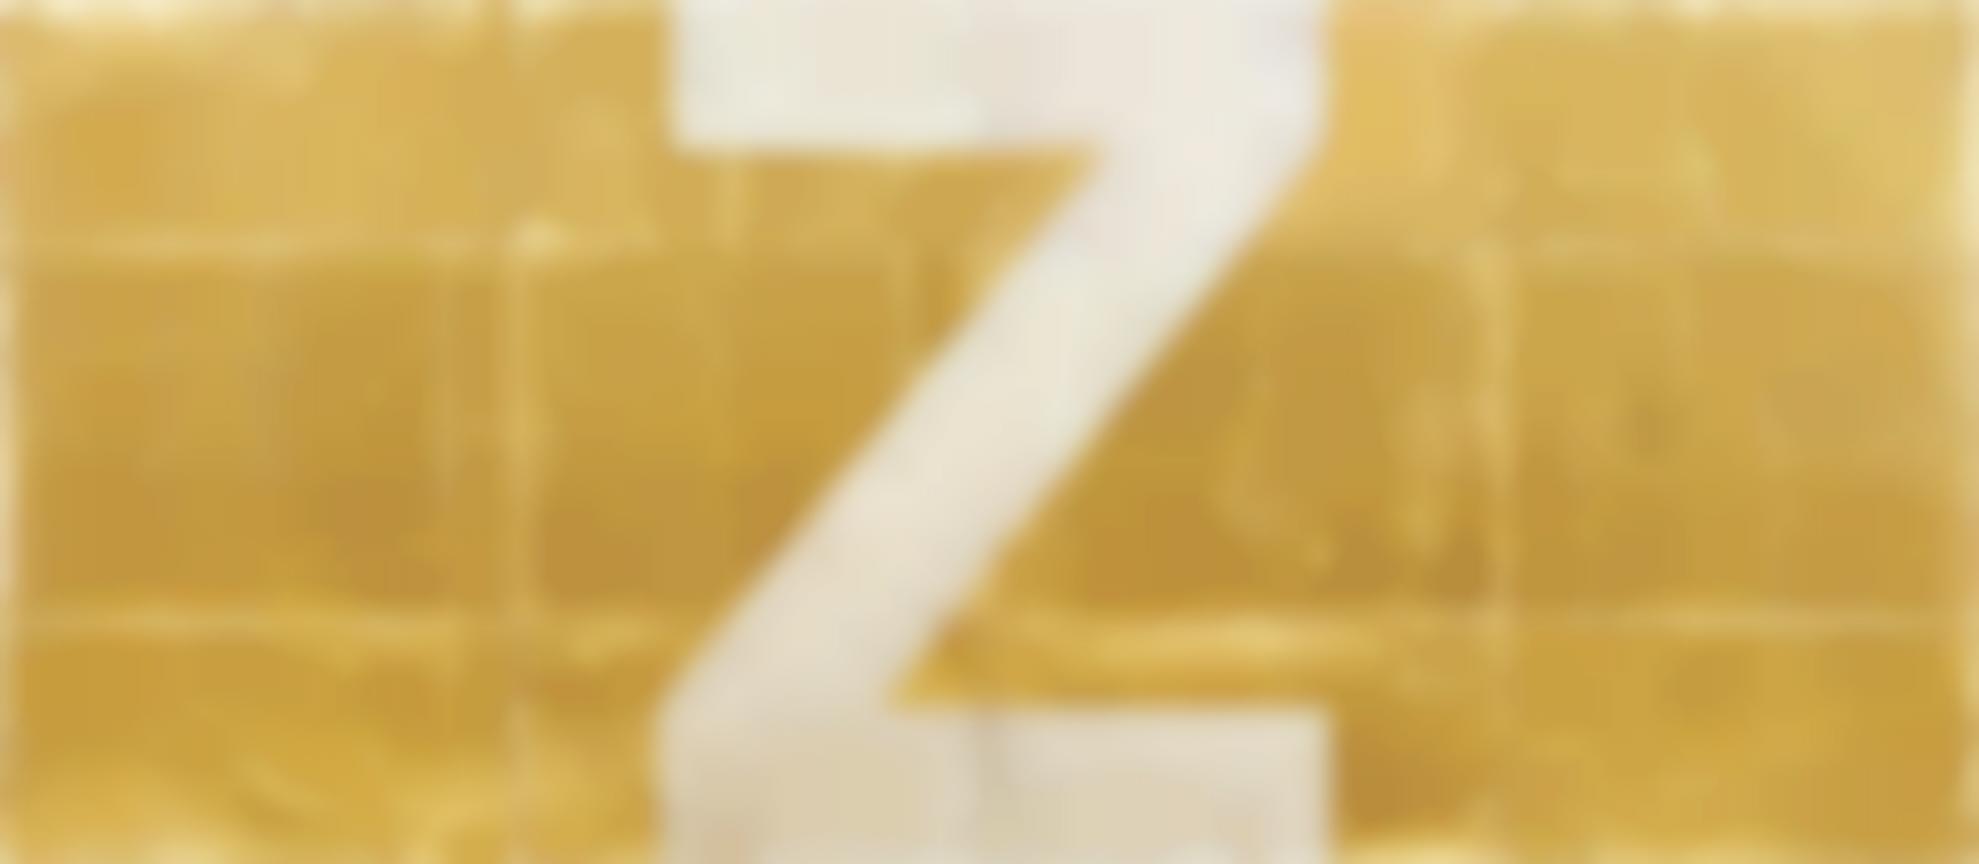 Danh Vo-Alphabet (Z)-2011